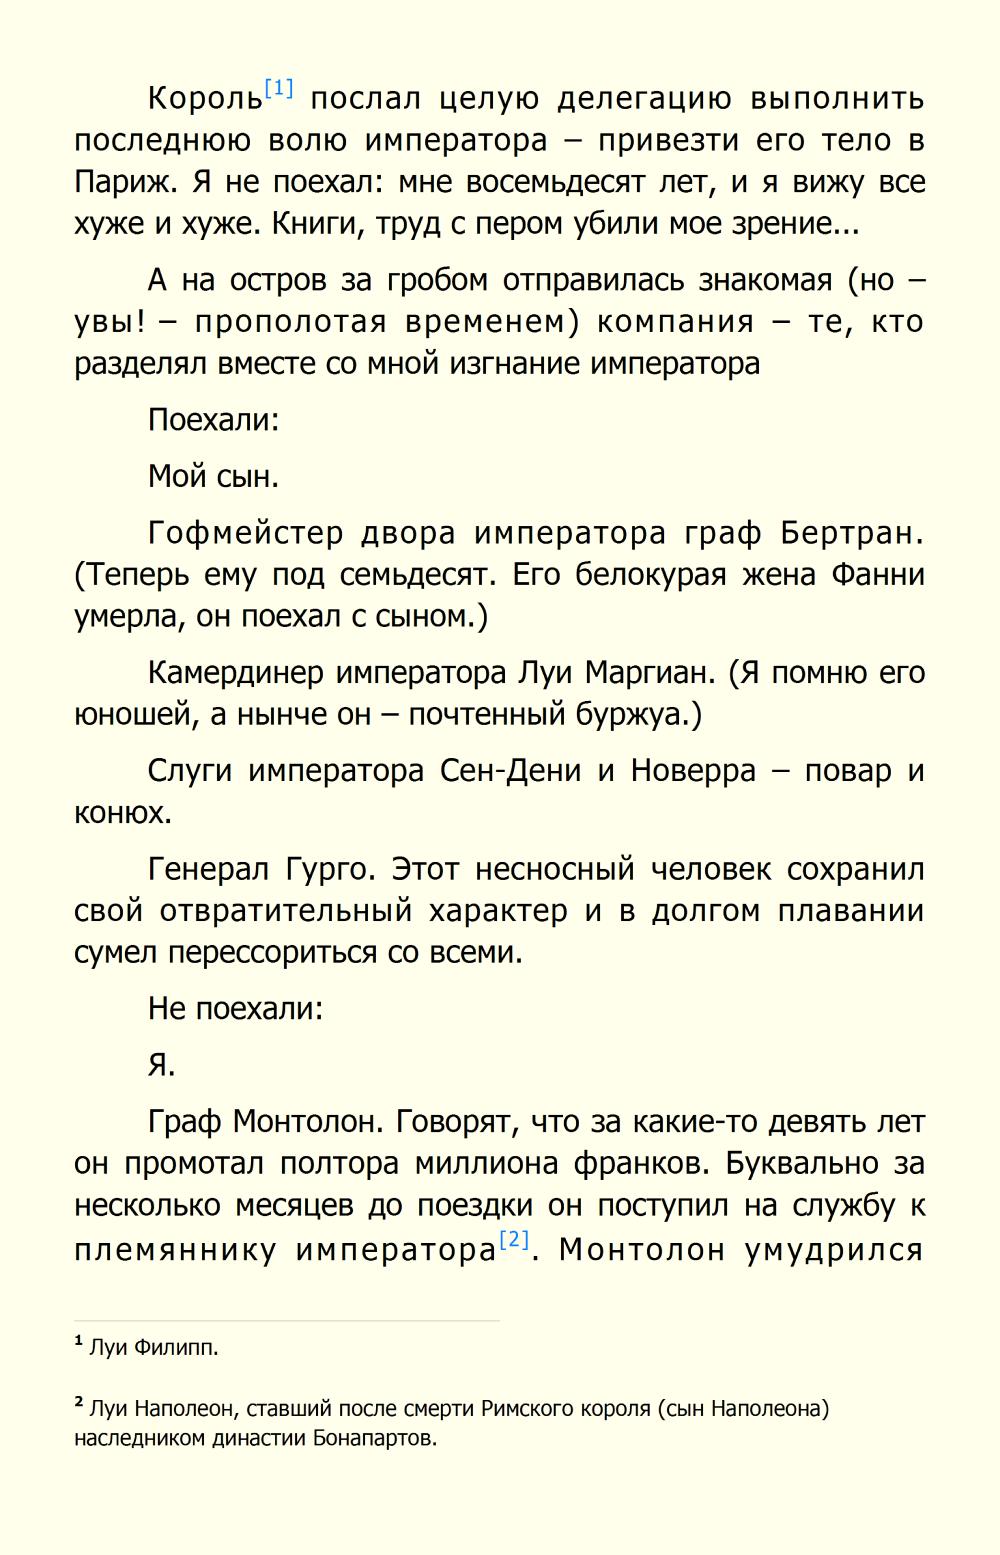 http://i6.imageban.ru/out/2013/11/10/d71b1883bba018019608e020d5c6f0e4.jpg